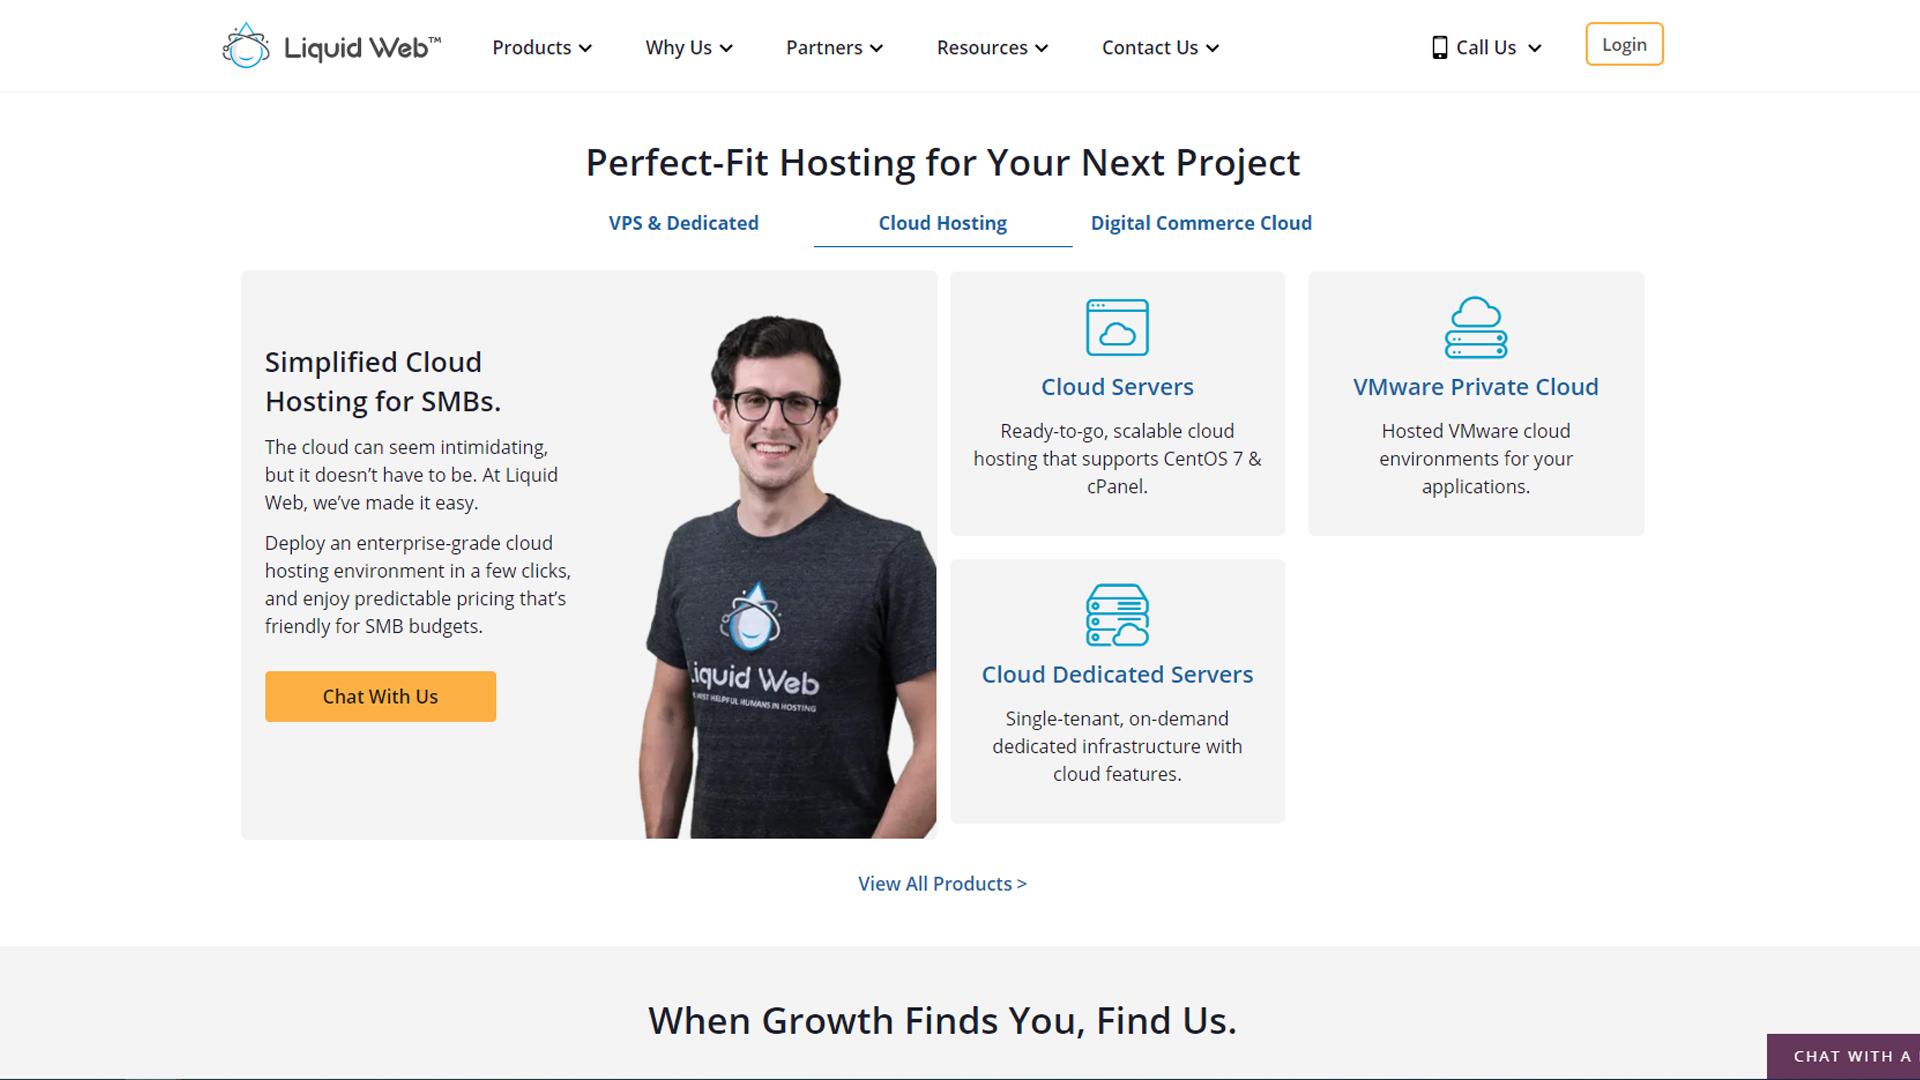 Liquid Web's cloud hosting homepage